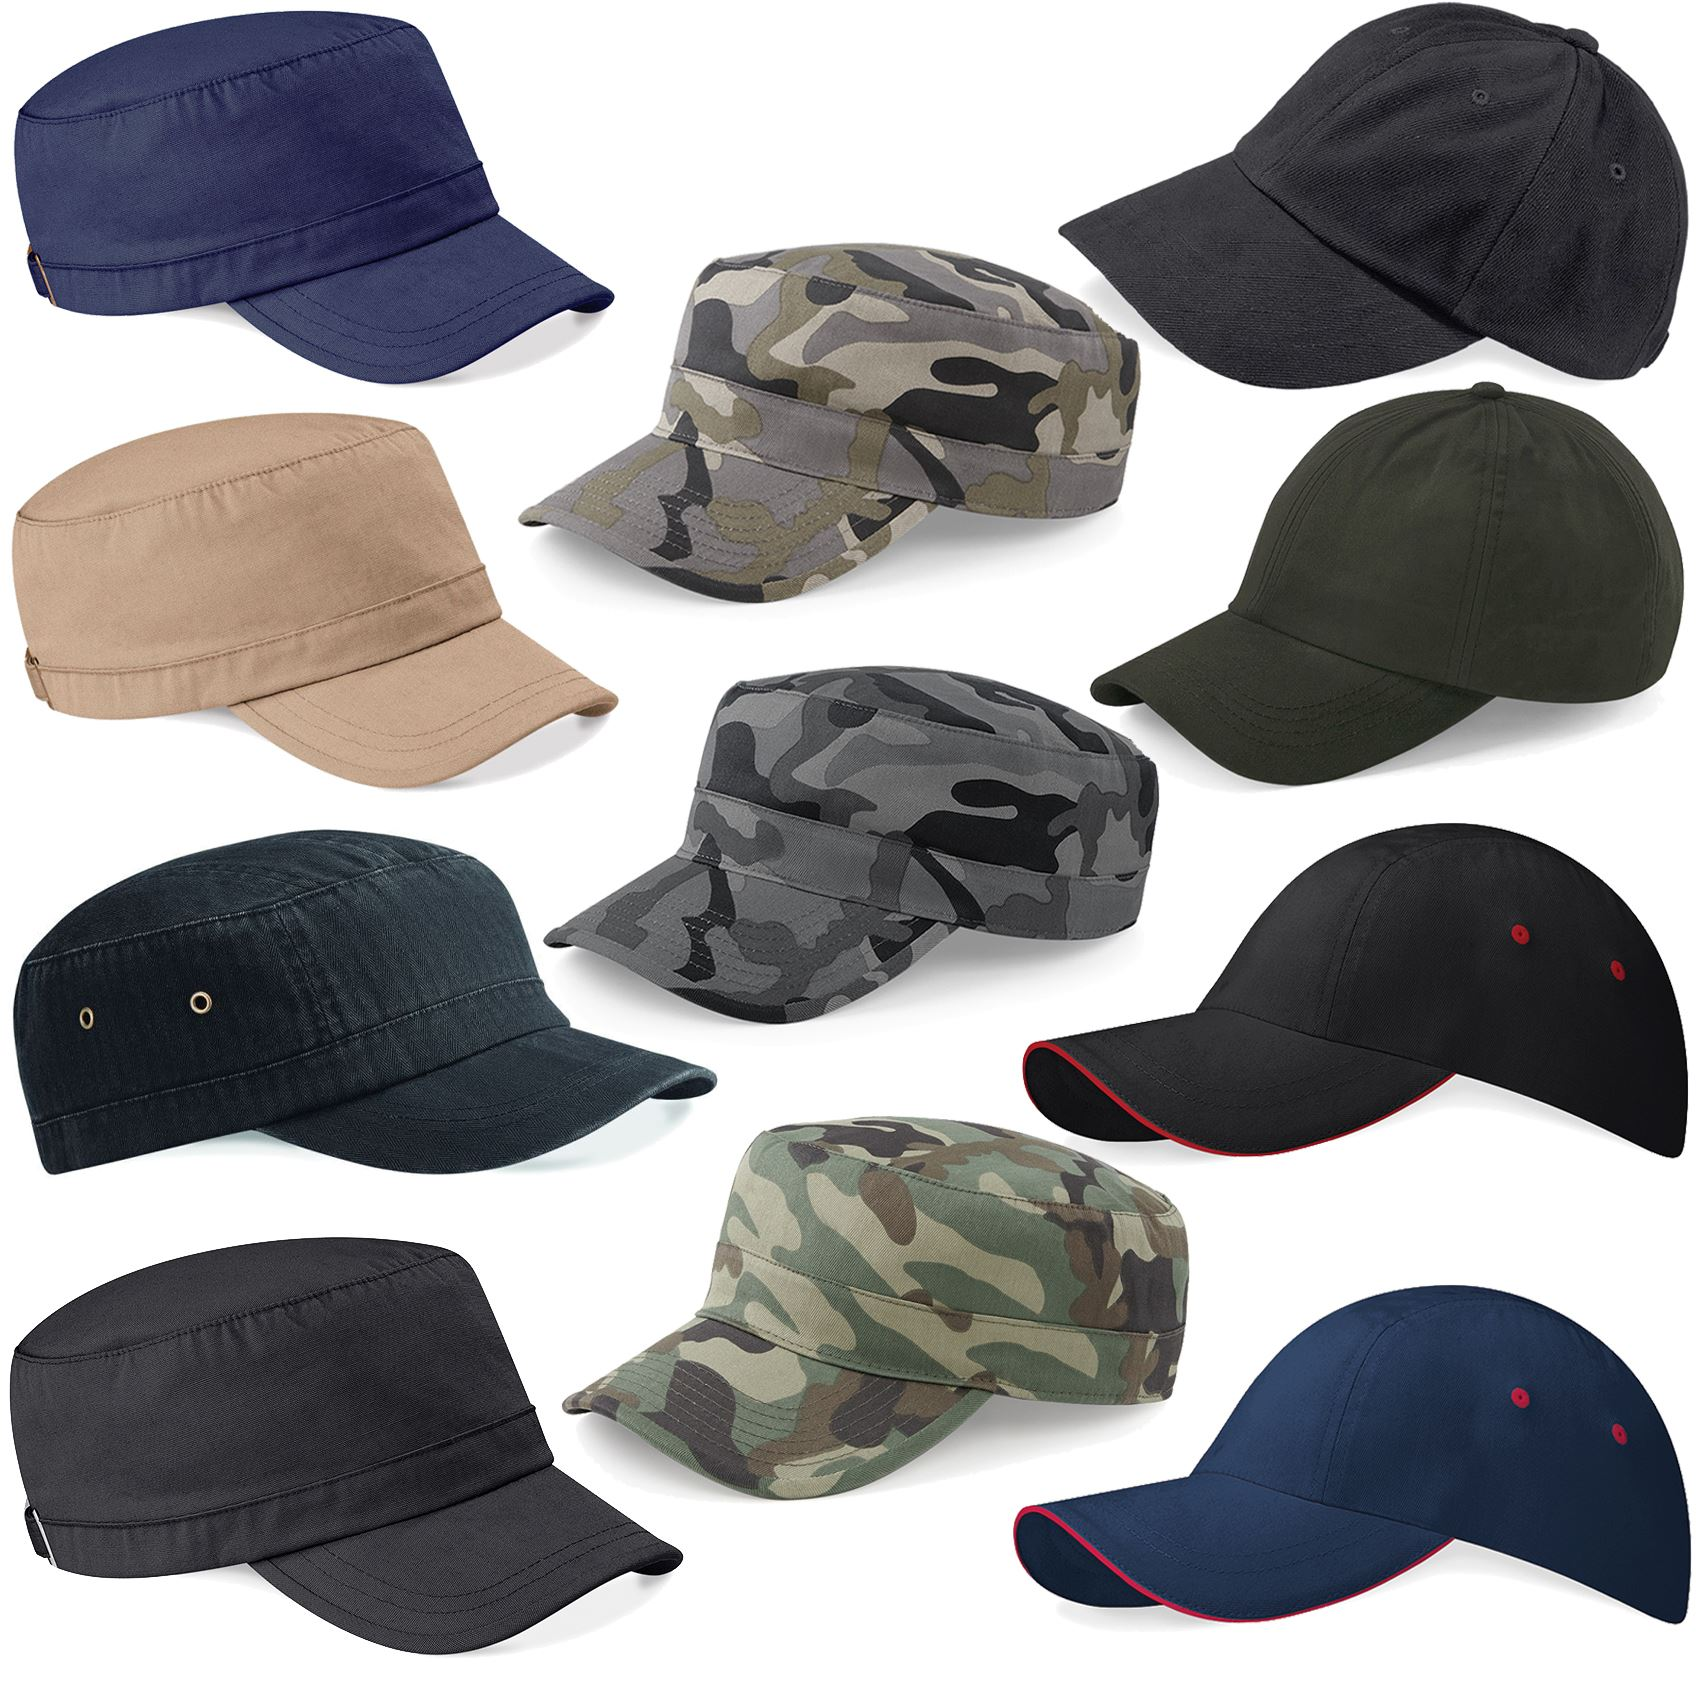 Unisex Mens Teamlife Urban VII 7 Panels Baseball Cap Adjustable Trucker Hats